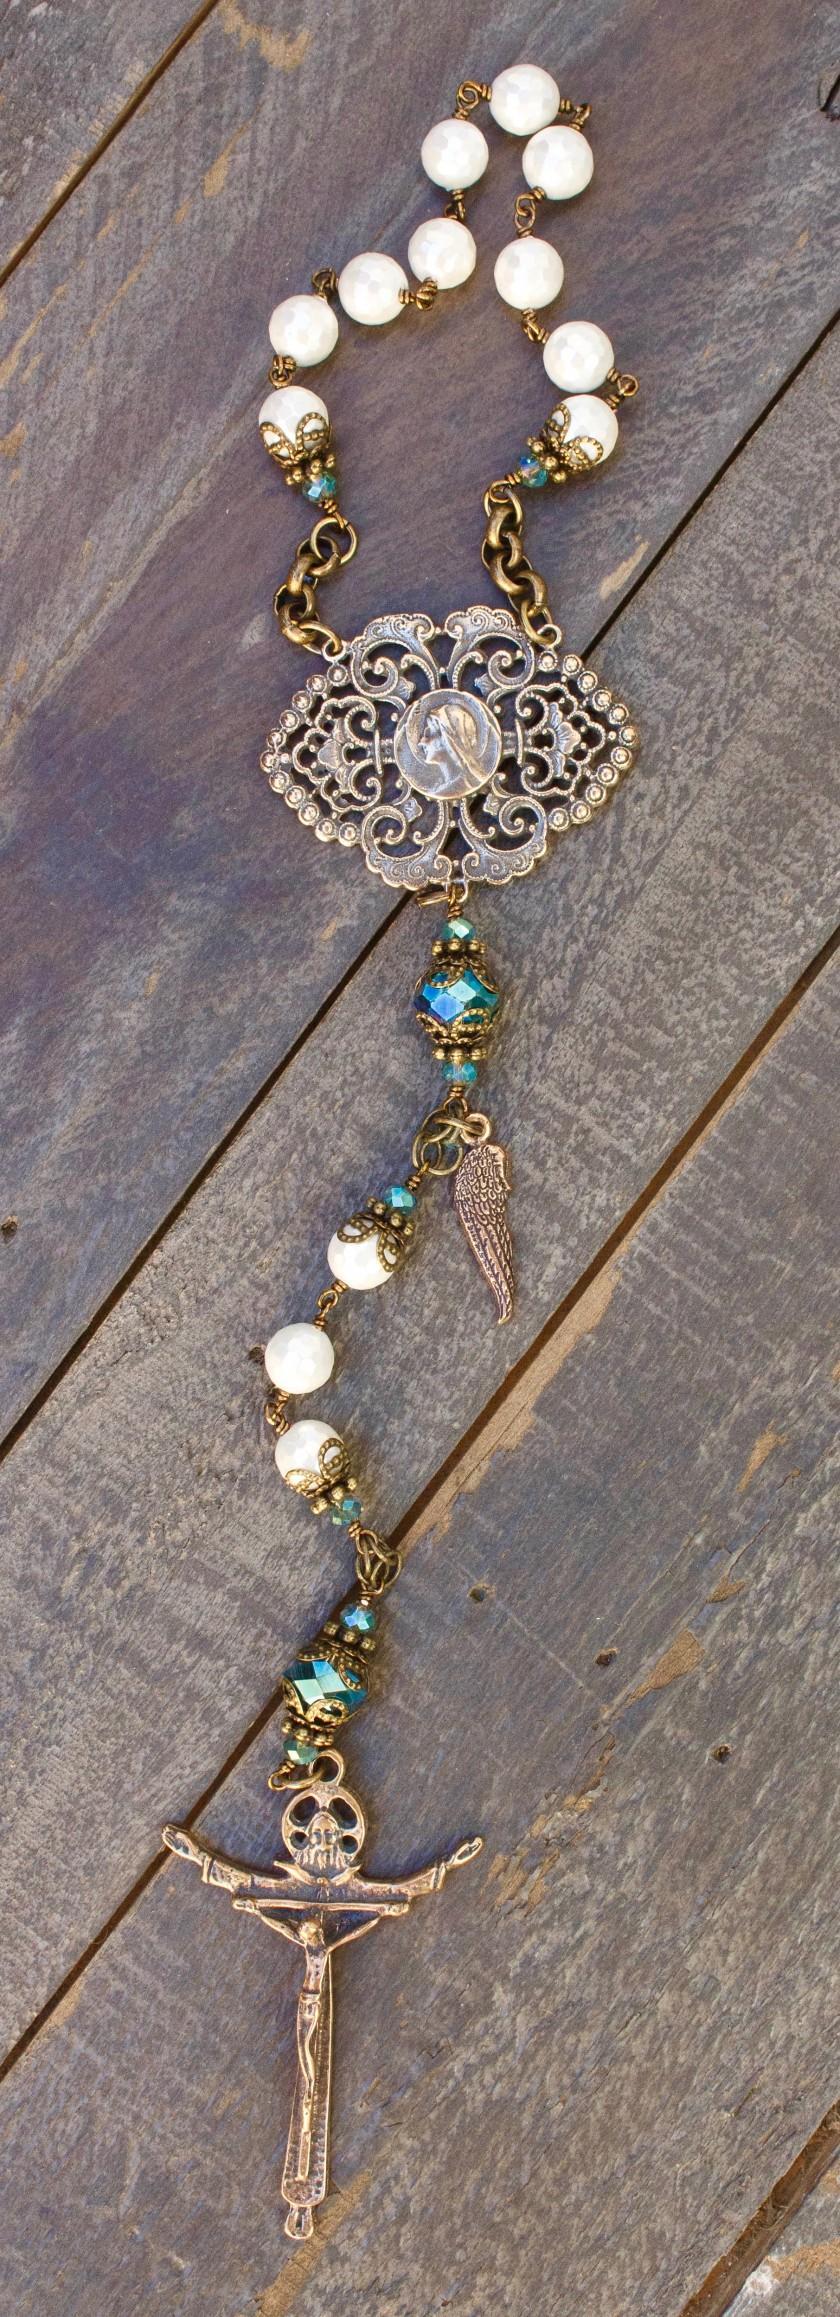 Aqua Crystal One-Decade Heirloom Rosary 8mm